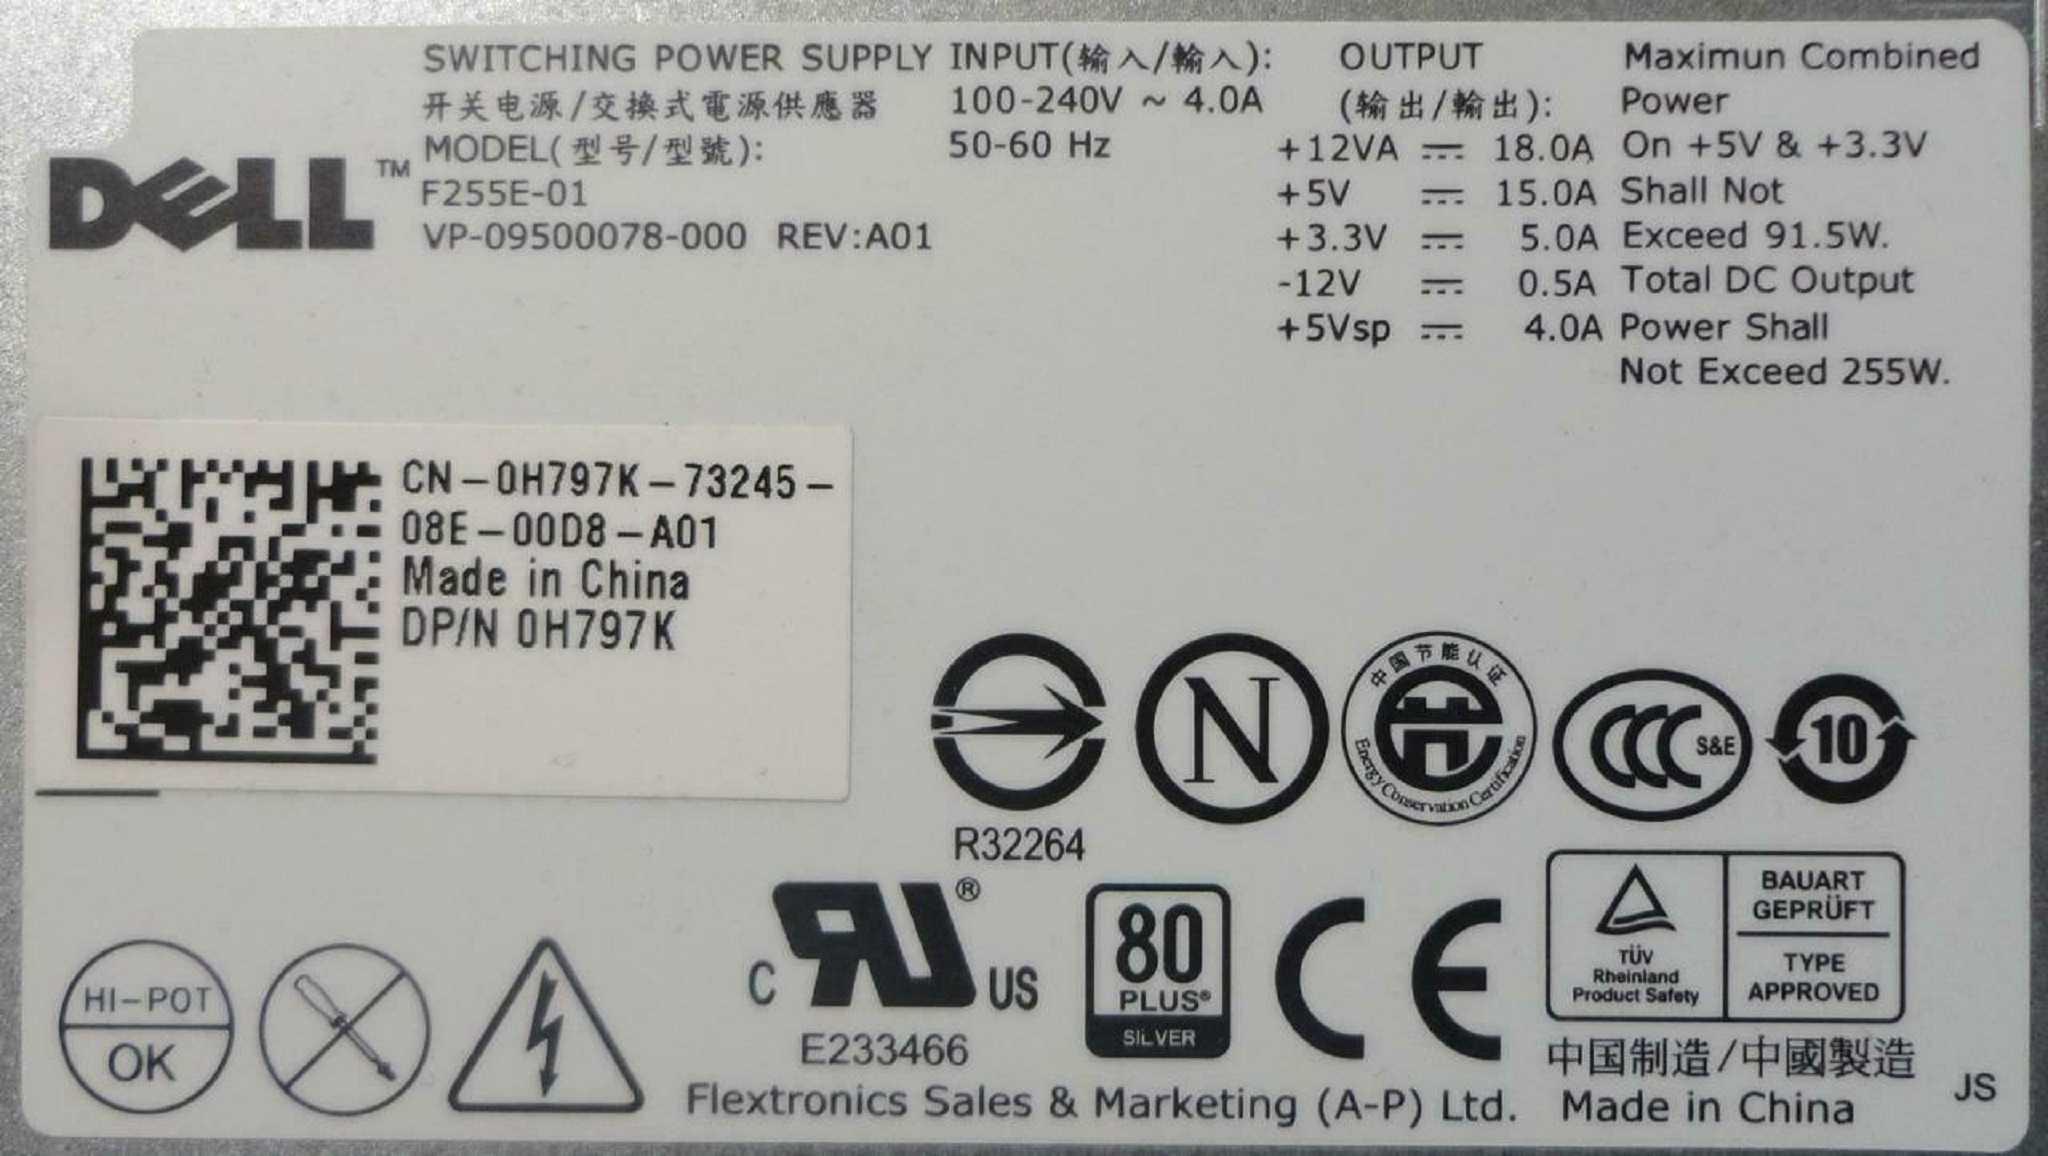 T164M  WU123  L255P-01  PS-5261-3DF-LF光宝开关电源0N249M  AC255AD-00  PC8051 康舒开关电源0H797K  CY826  F255E-01  VP-09500052-000交换式电源供应器